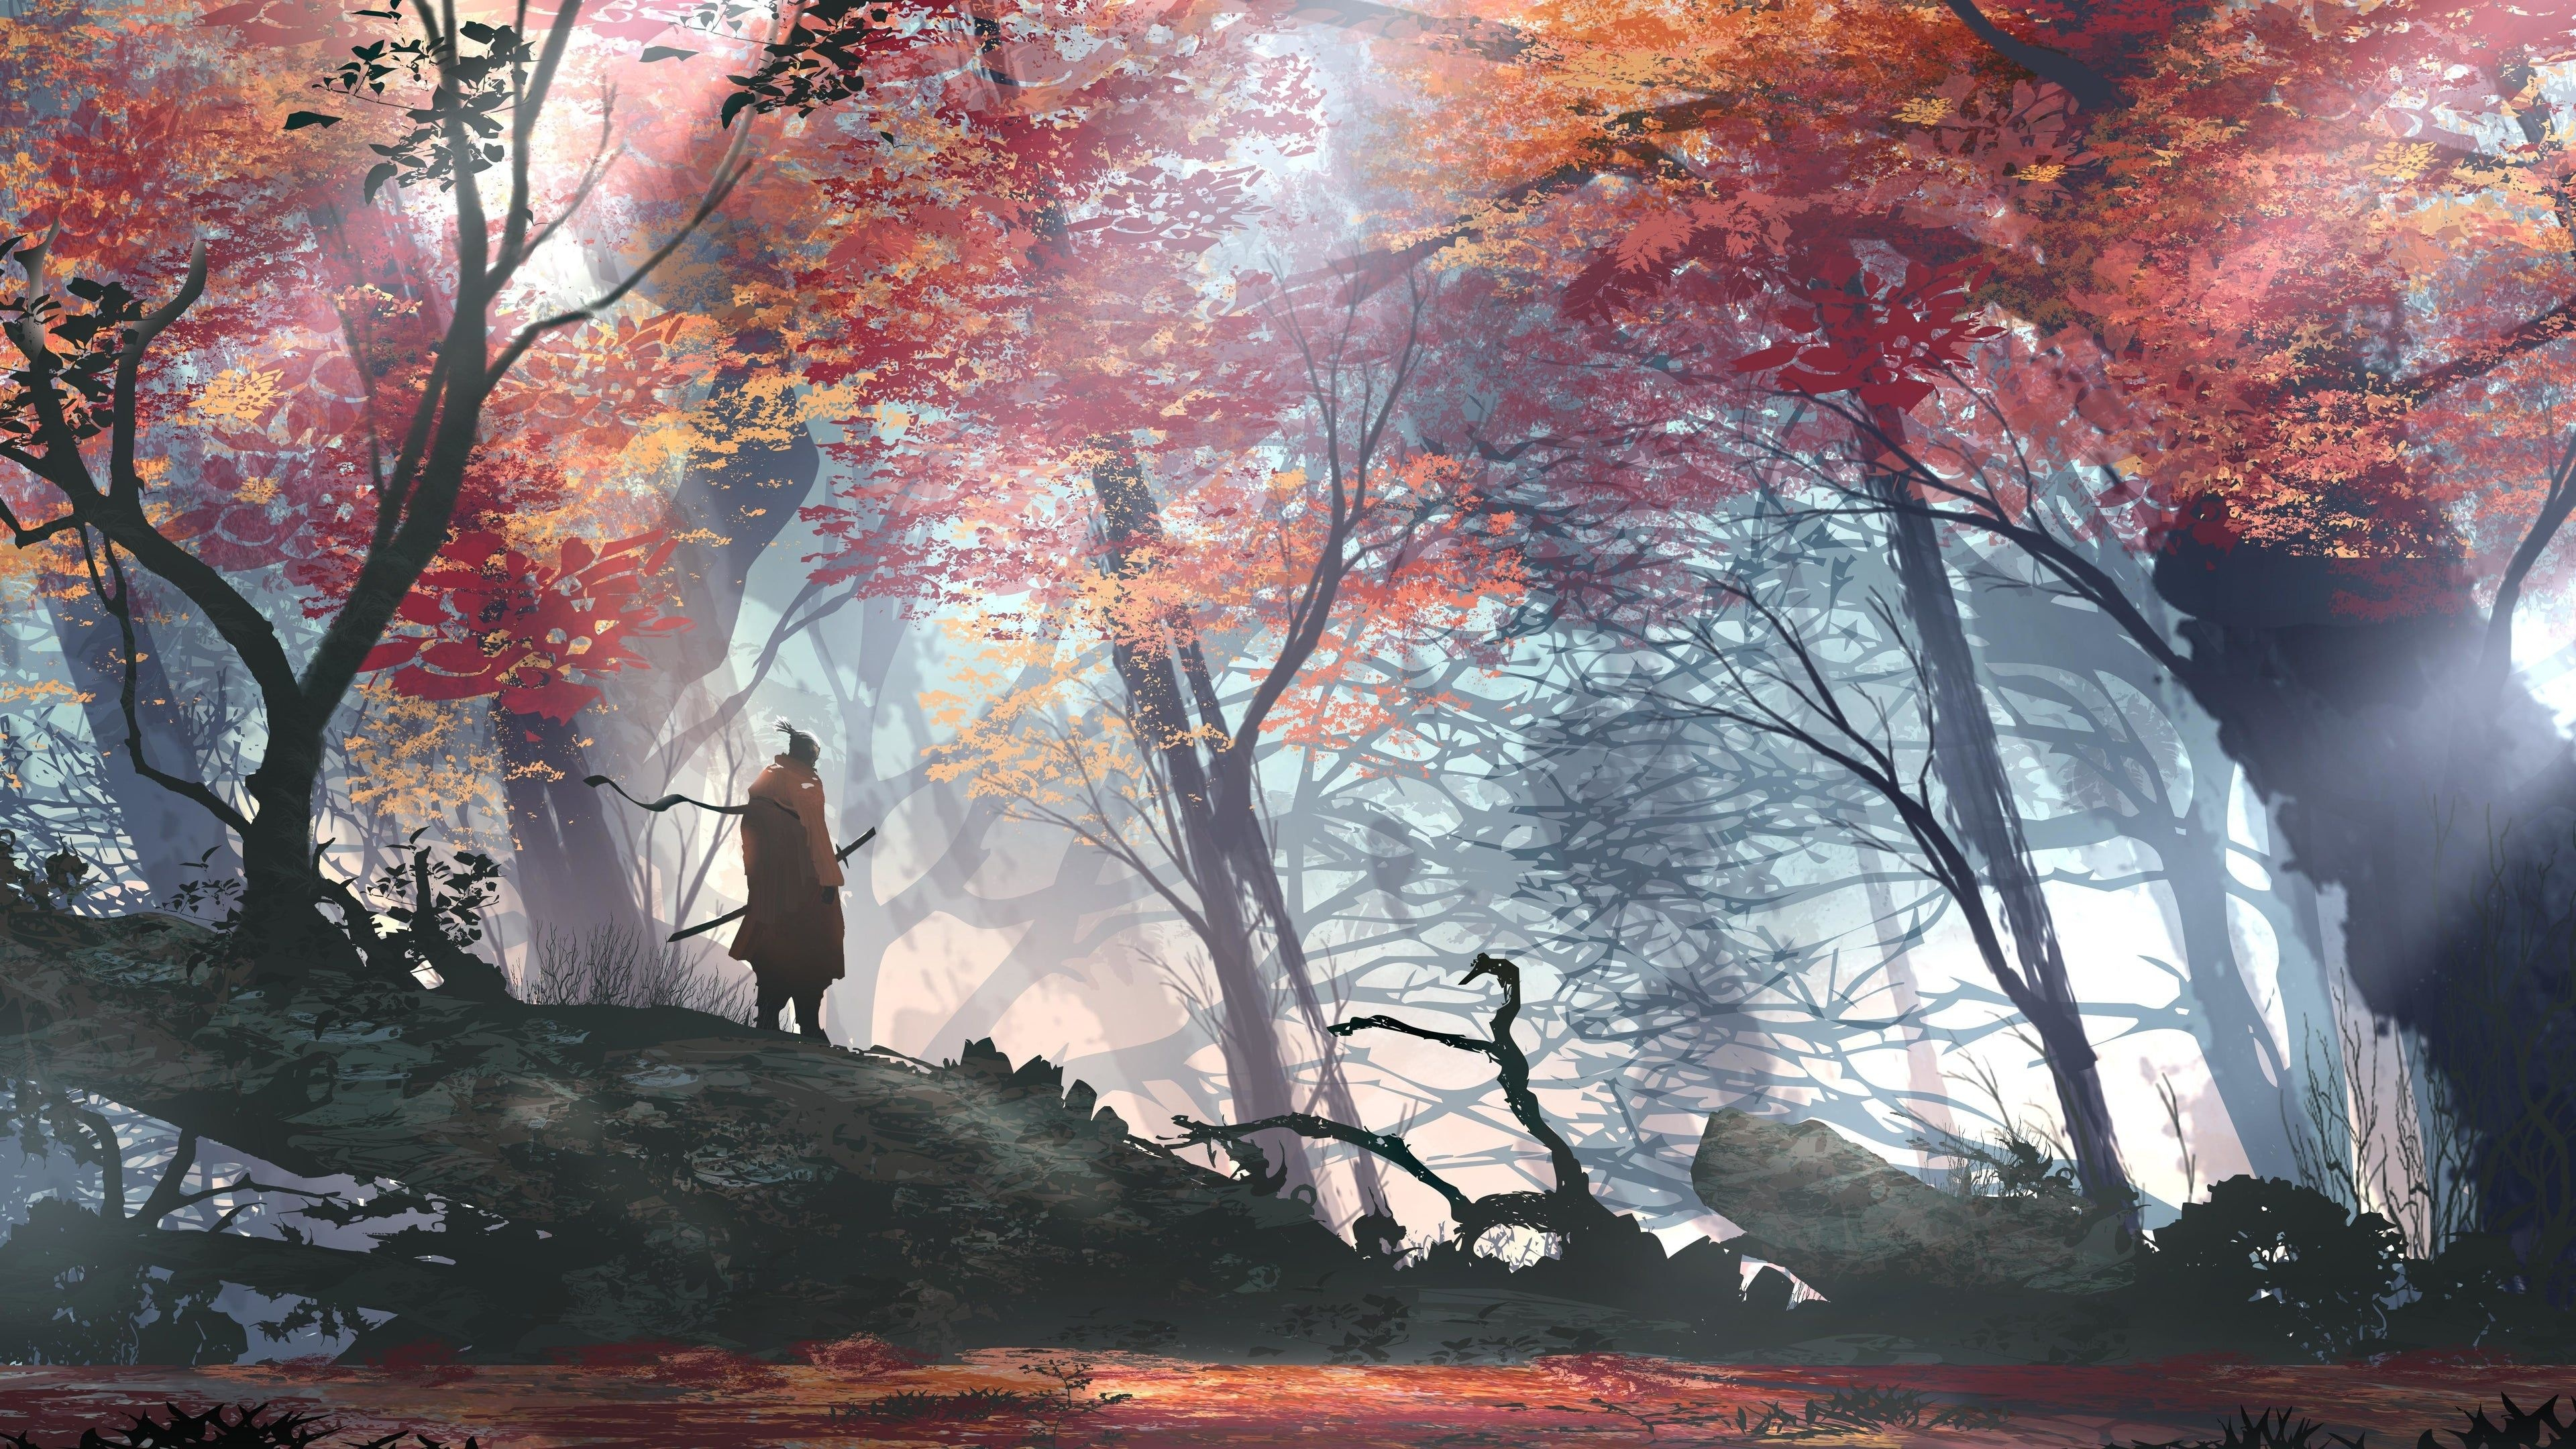 Fall Art desktop wallpaper free download